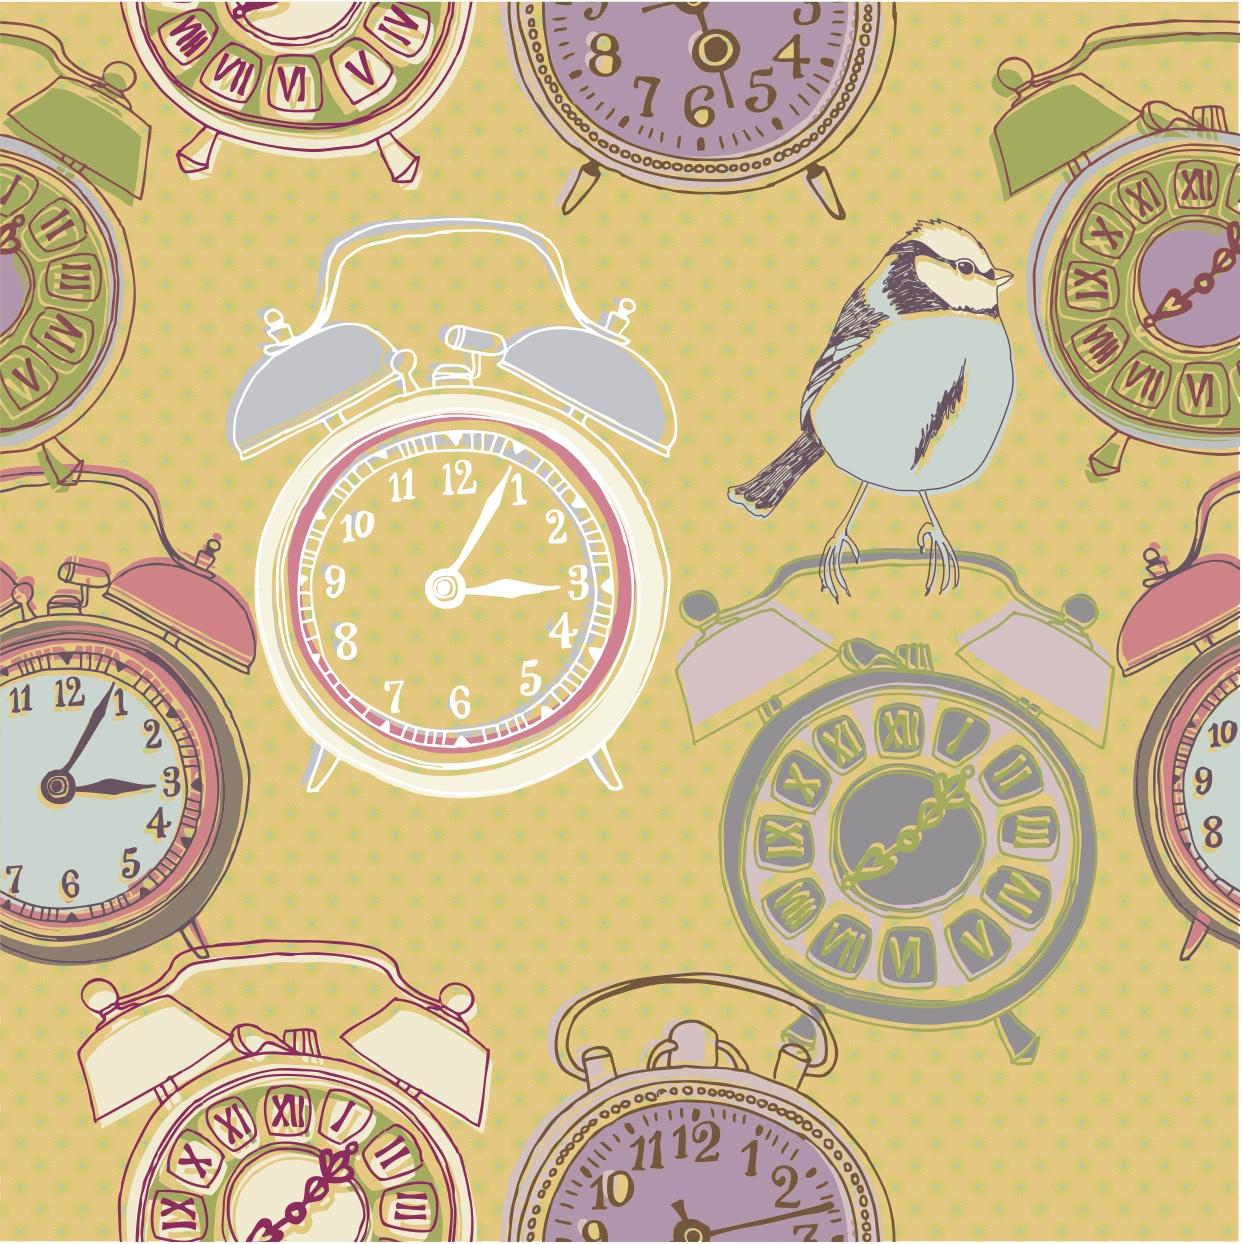 Image: ticking clocks